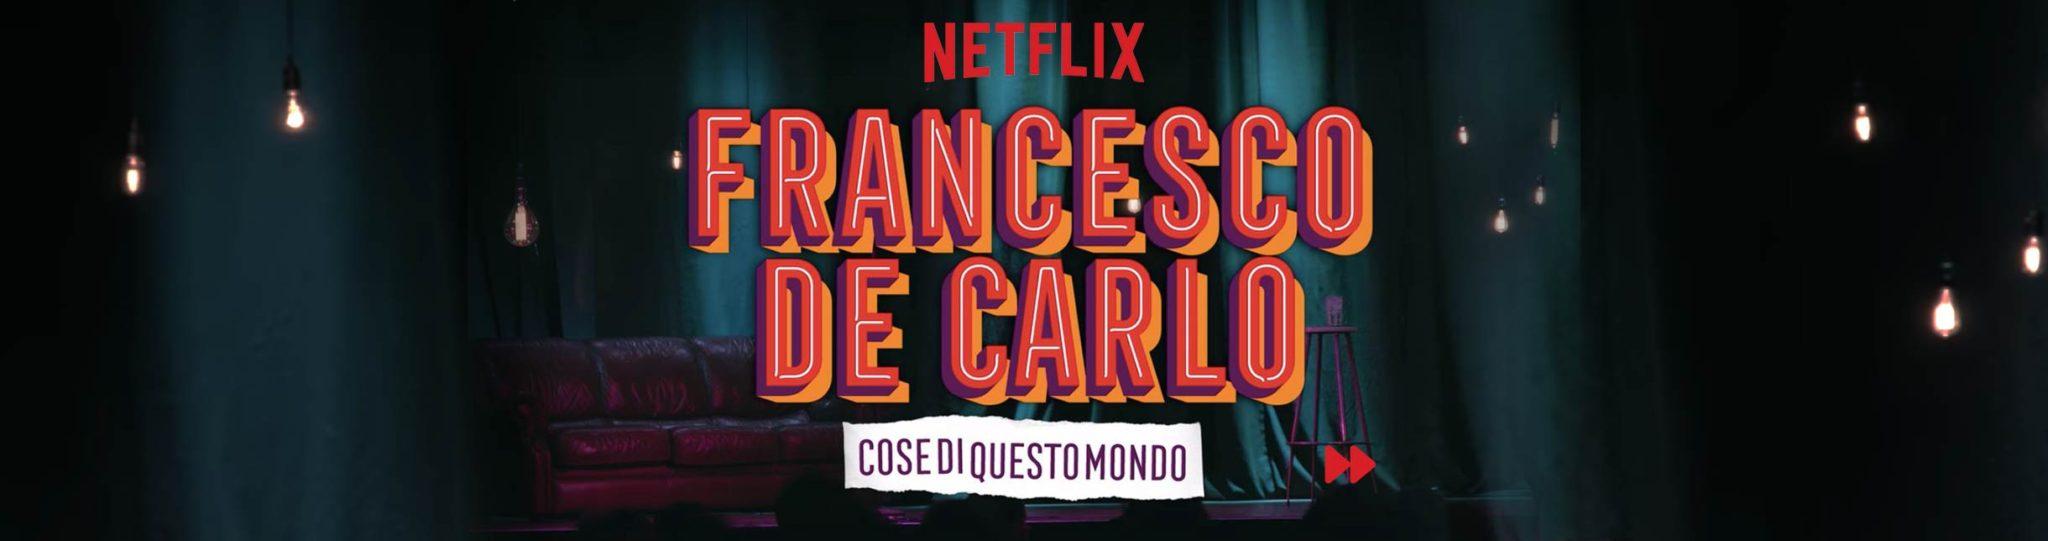 Francesco De Carlo Netflix Special